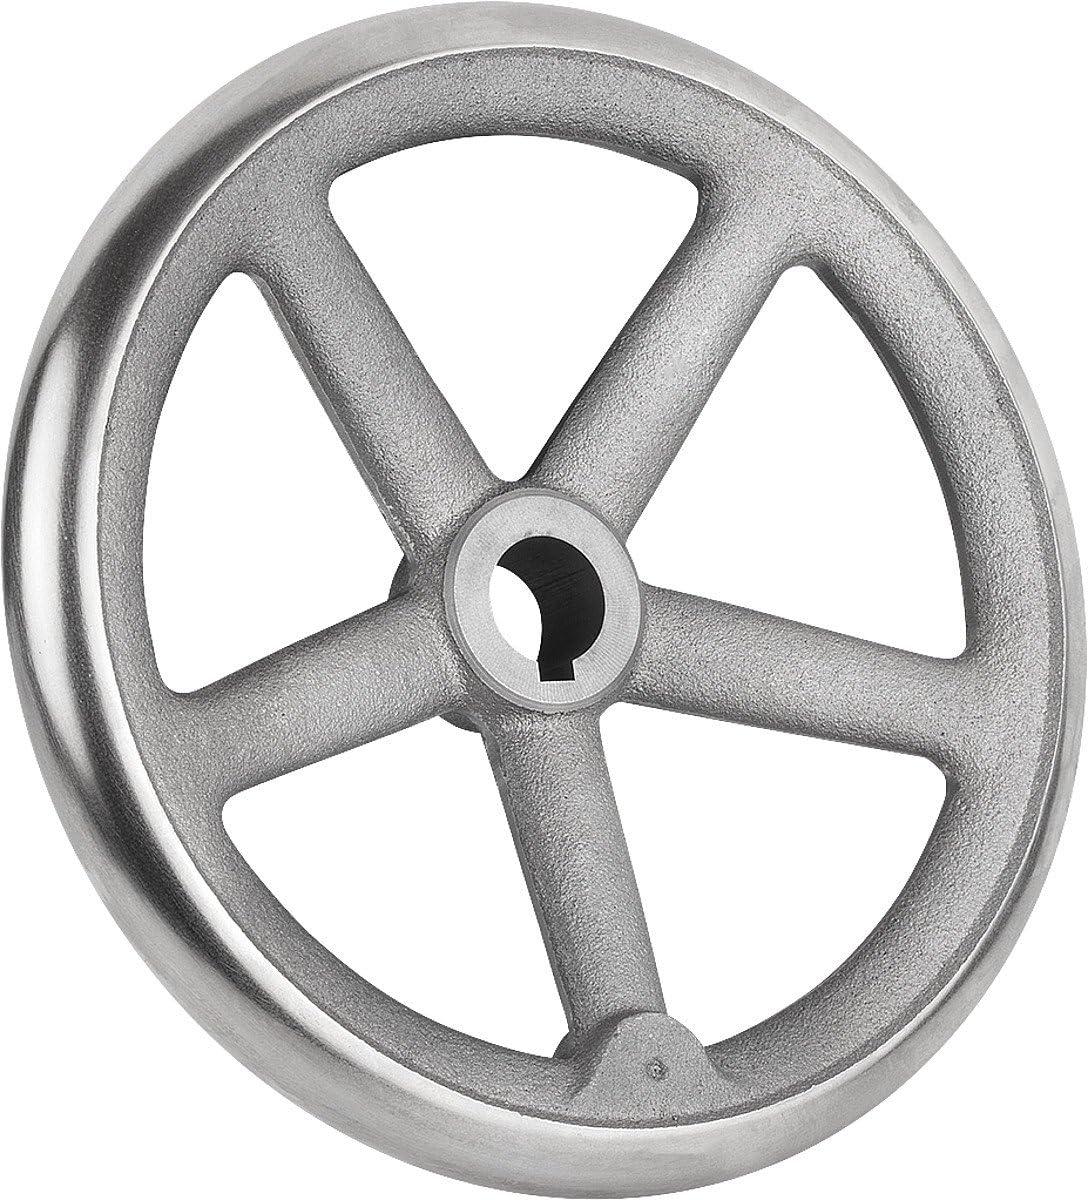 /40/cm Tilt Hand Cast Iron Wheel with Nut Without Handle Complete: Steel D2/ D1/= 500/ k0671.1500x40 W